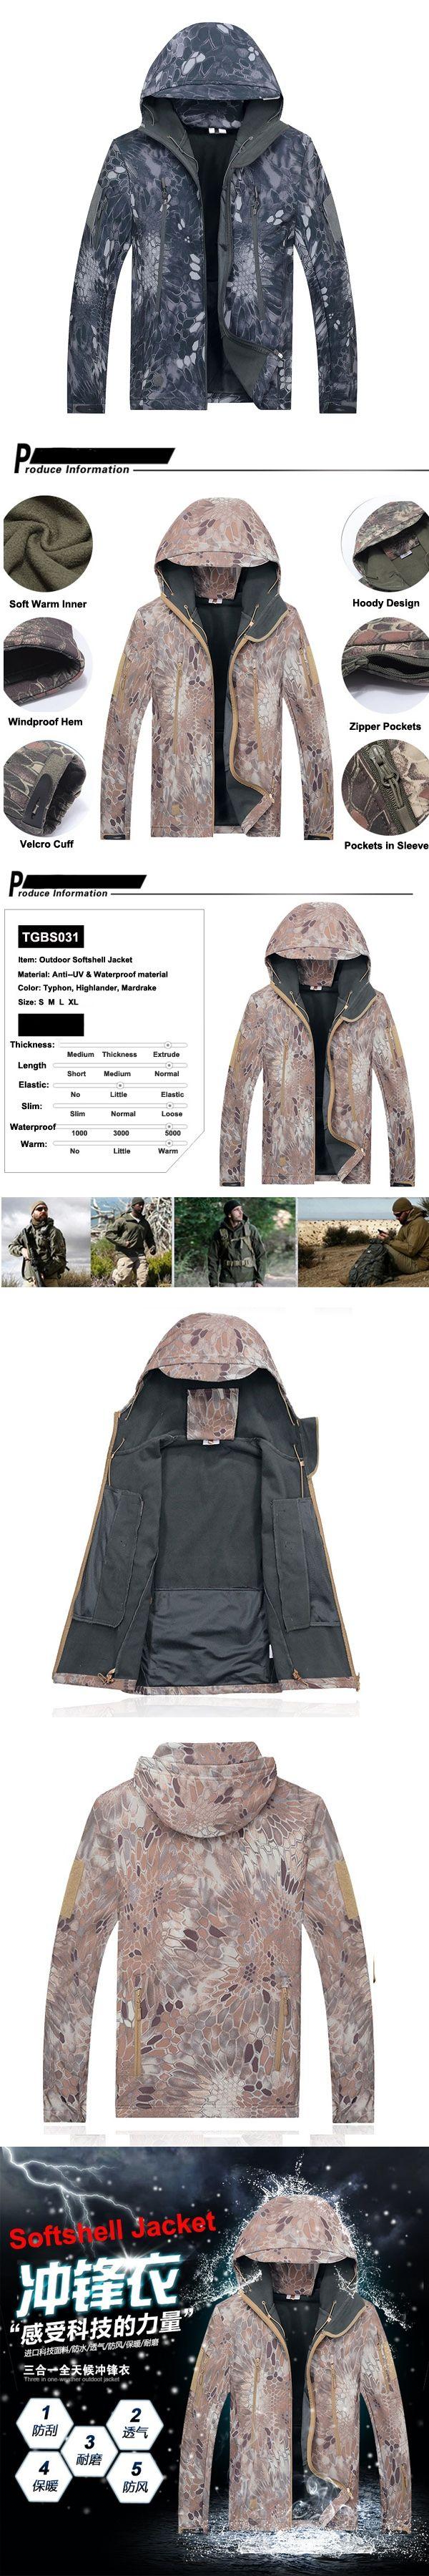 Highlander Softshell Jacket TAD tactical Softshell hoody Thermal jacket Kryptek softshell Outerwear